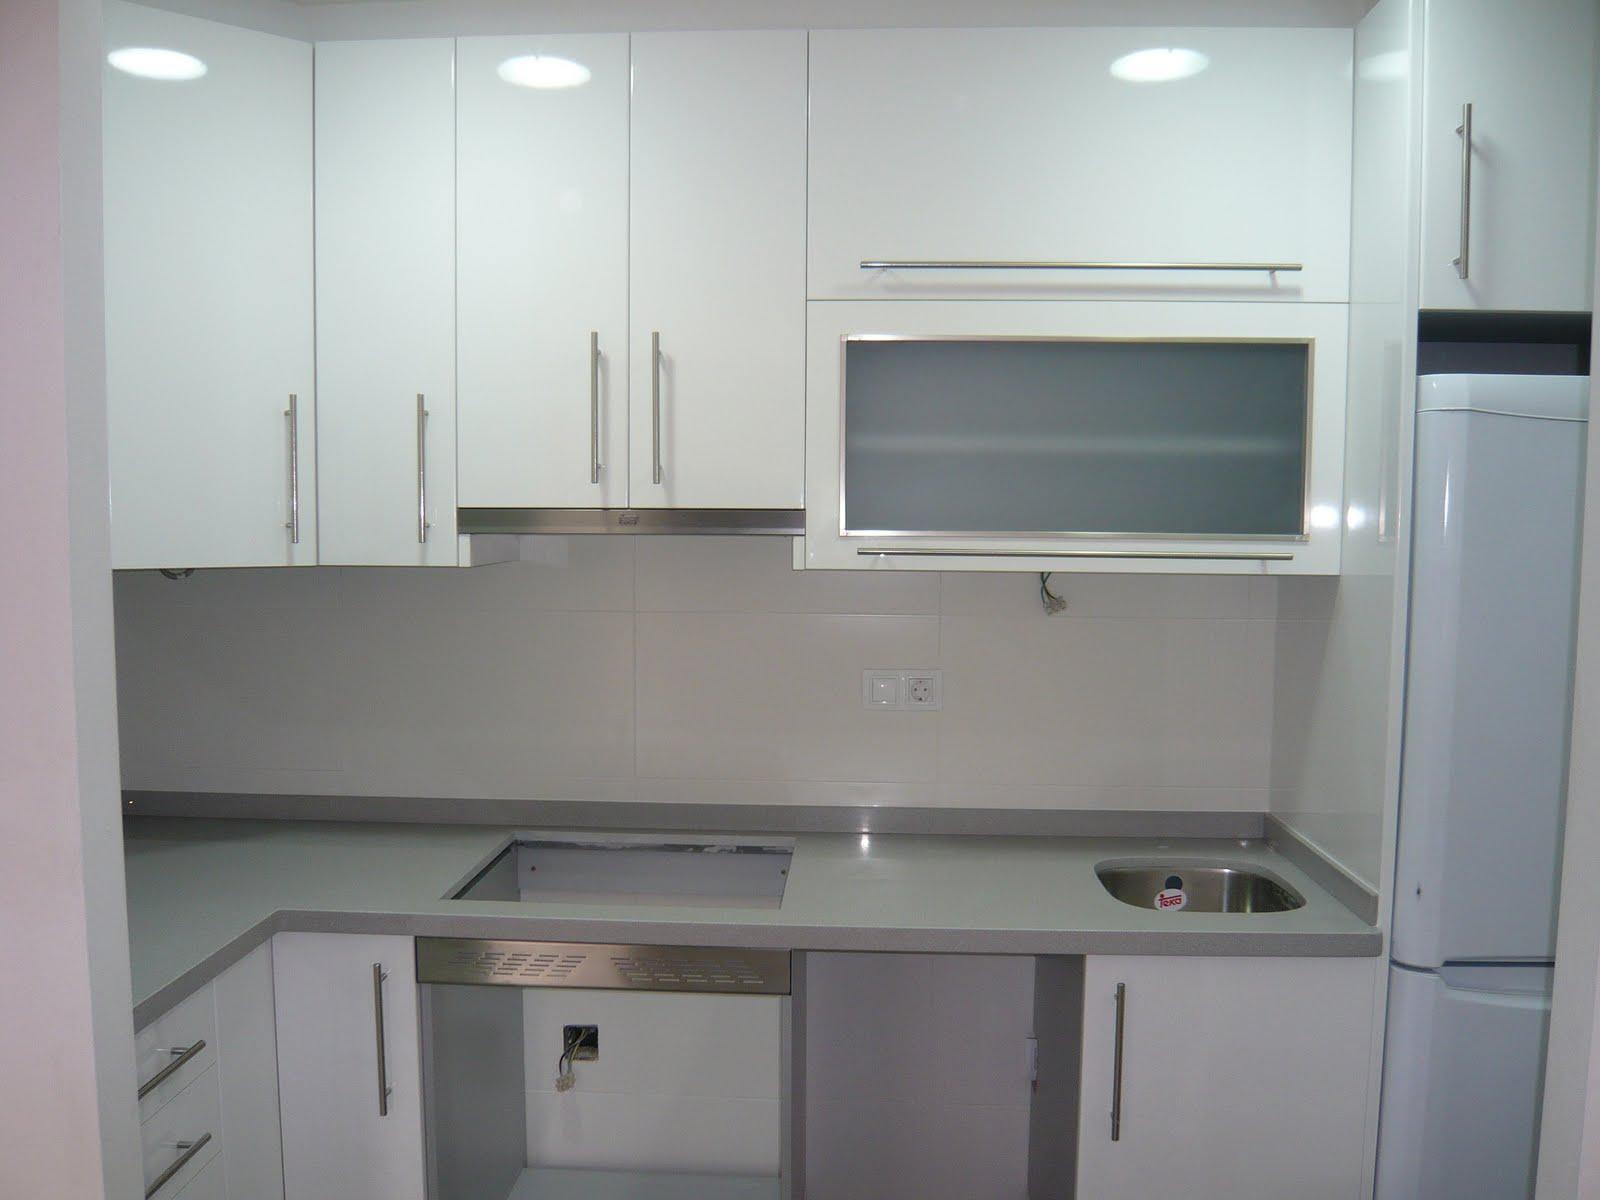 Reuscuina cocina en formica blanca for Puertas de cocina formica